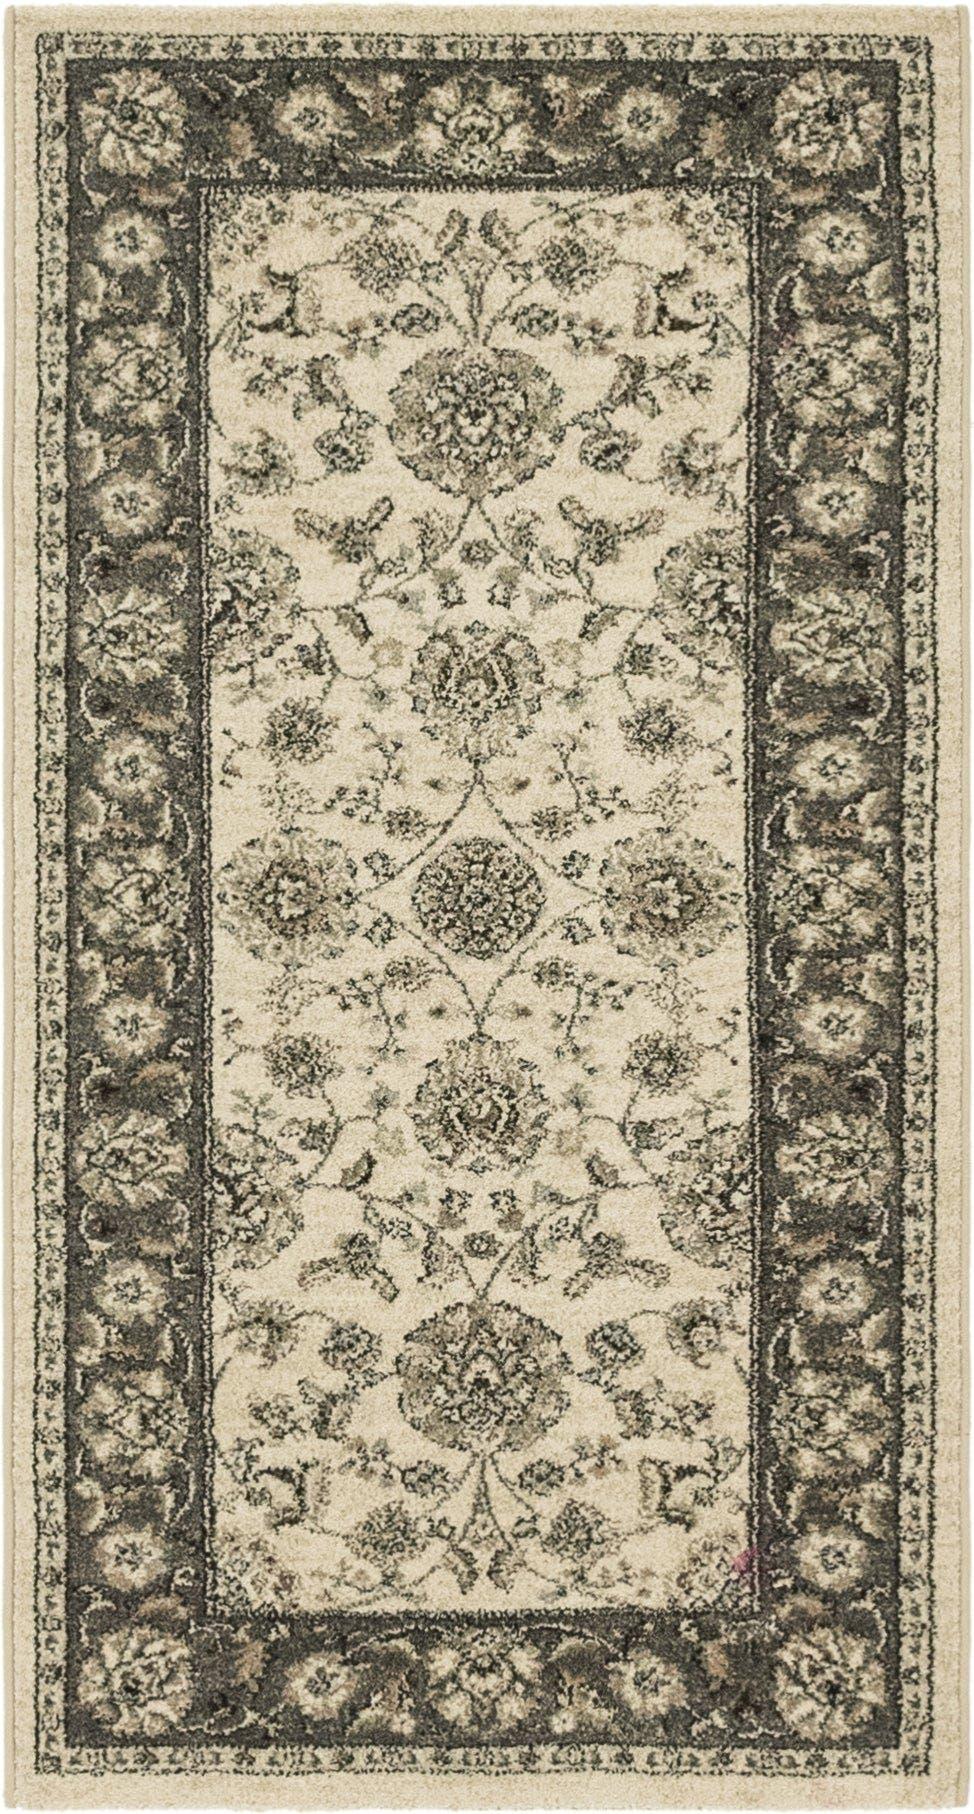 2' 7 x 5' Kashan Design Rug main image